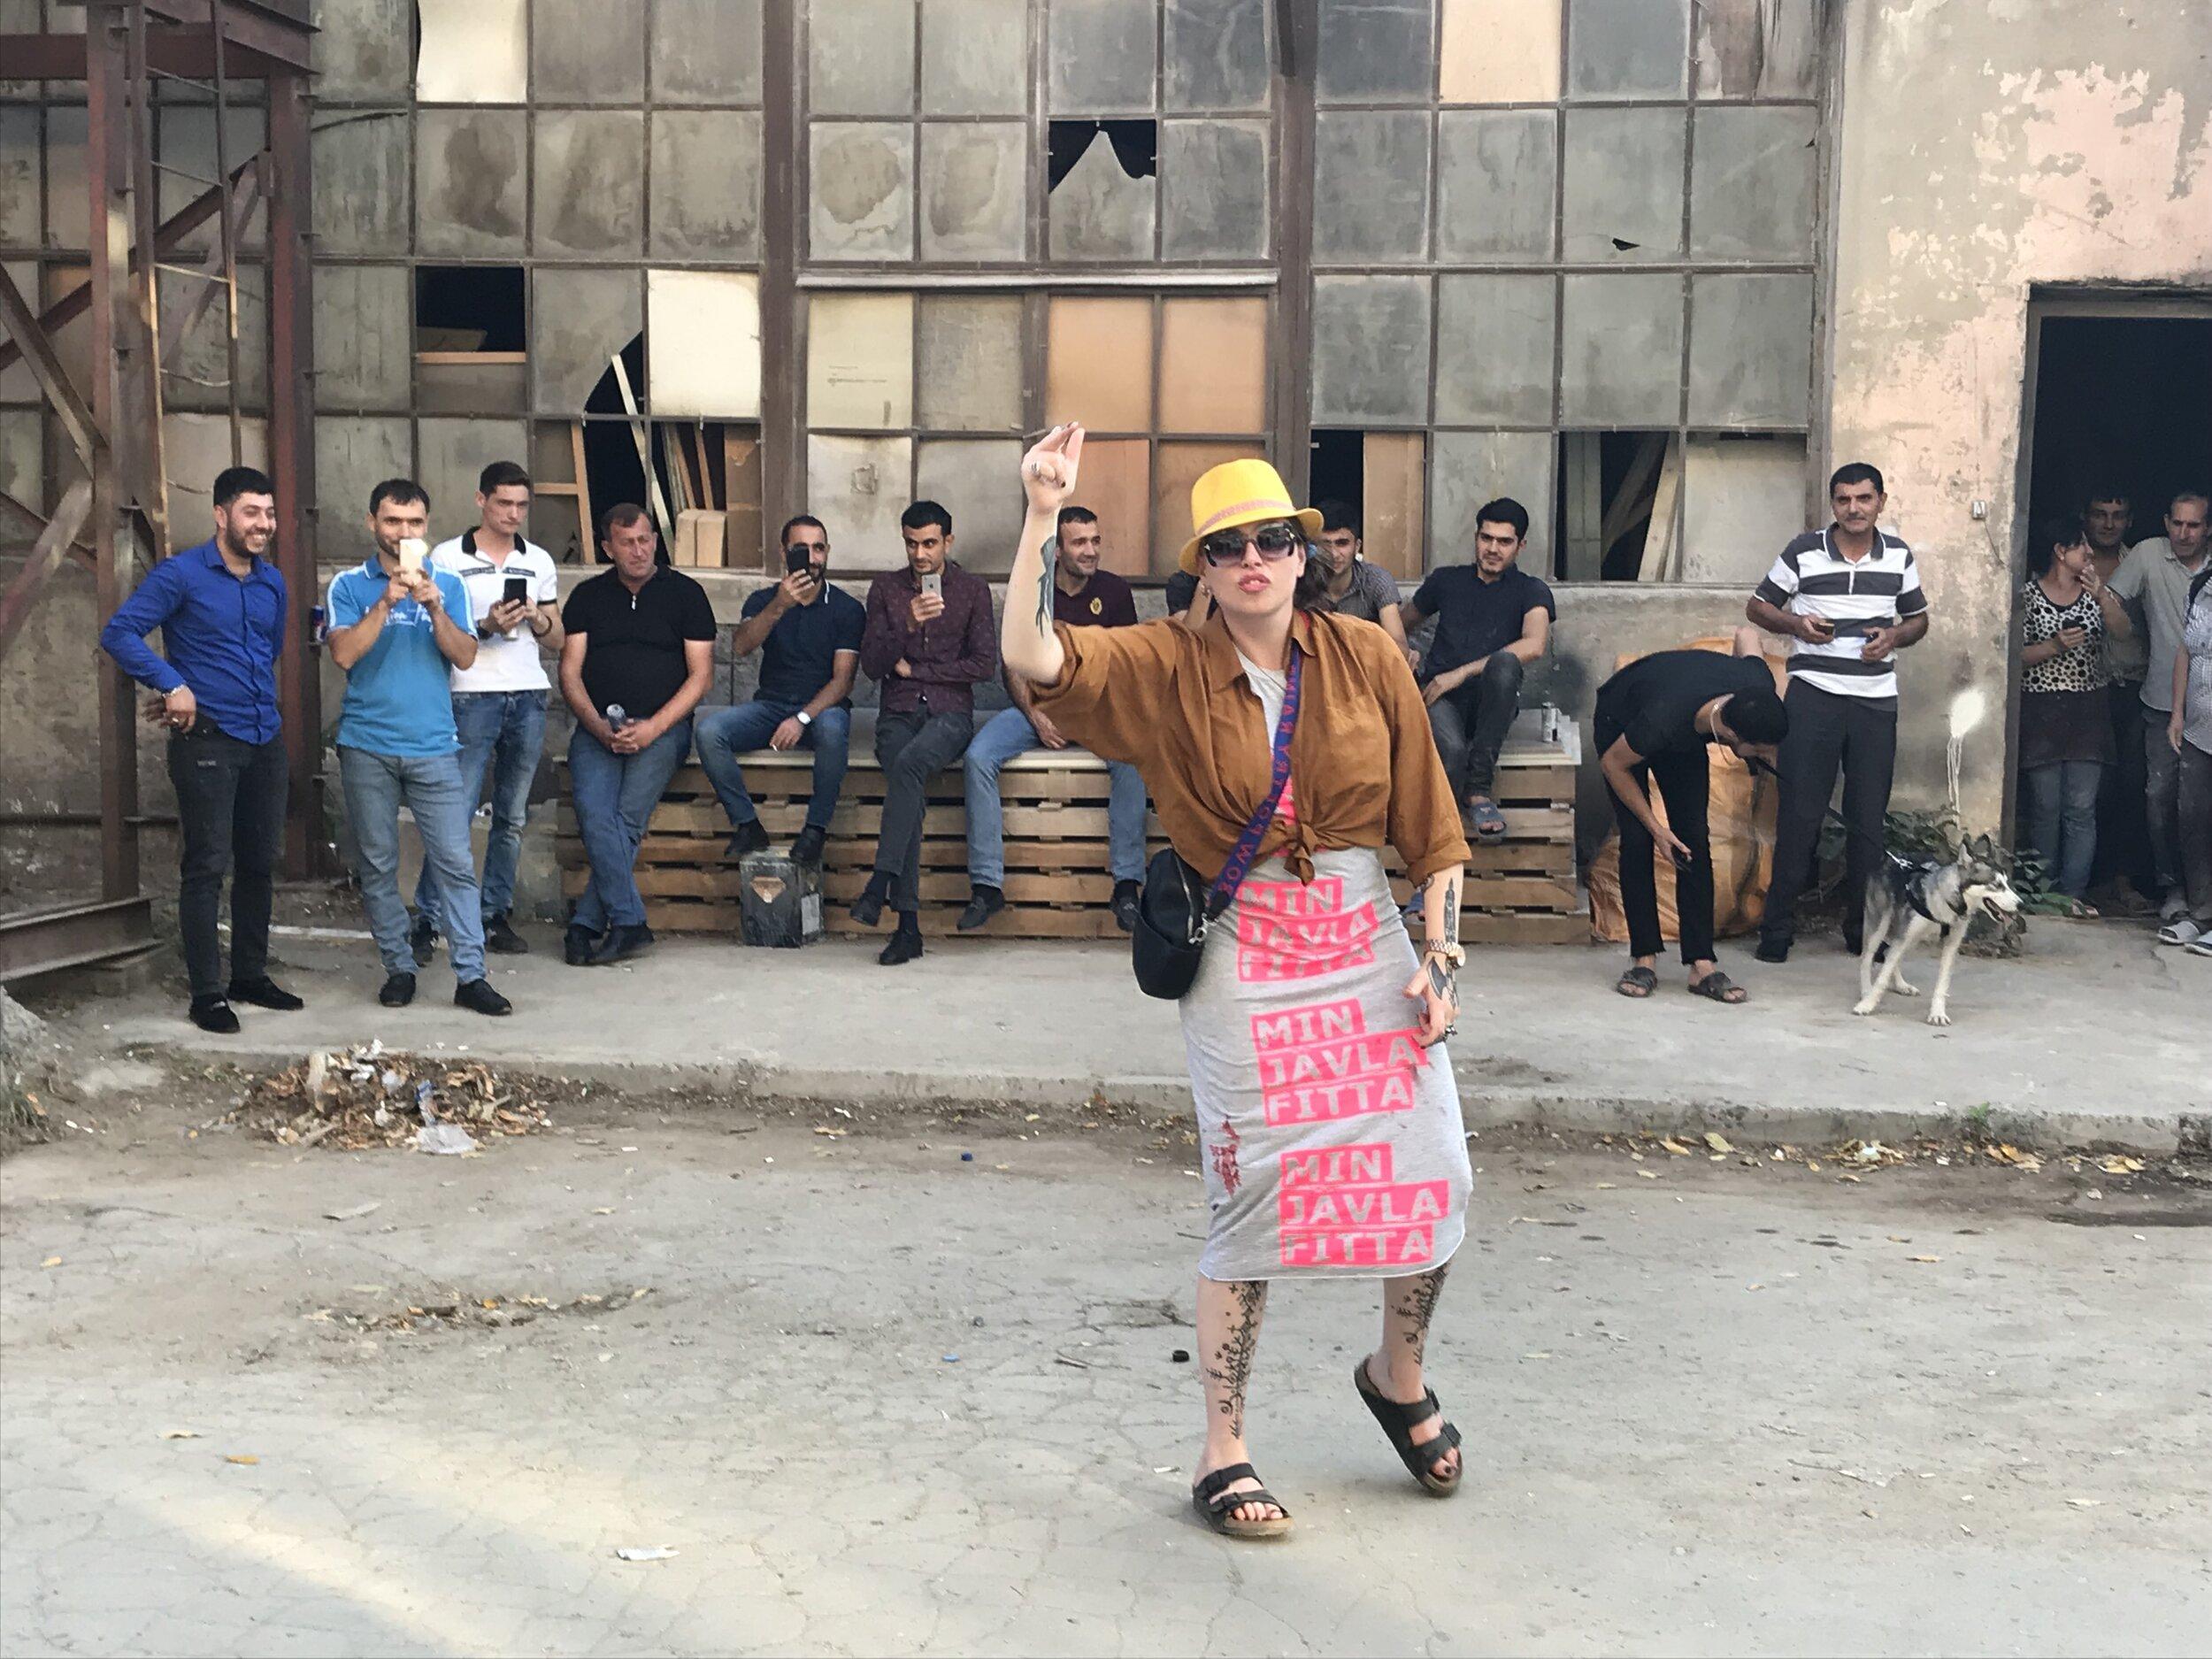 Каролина Фалкольт танцует на открытии «Kombinat Urban Art Show». Фото: Константин Дорошенко